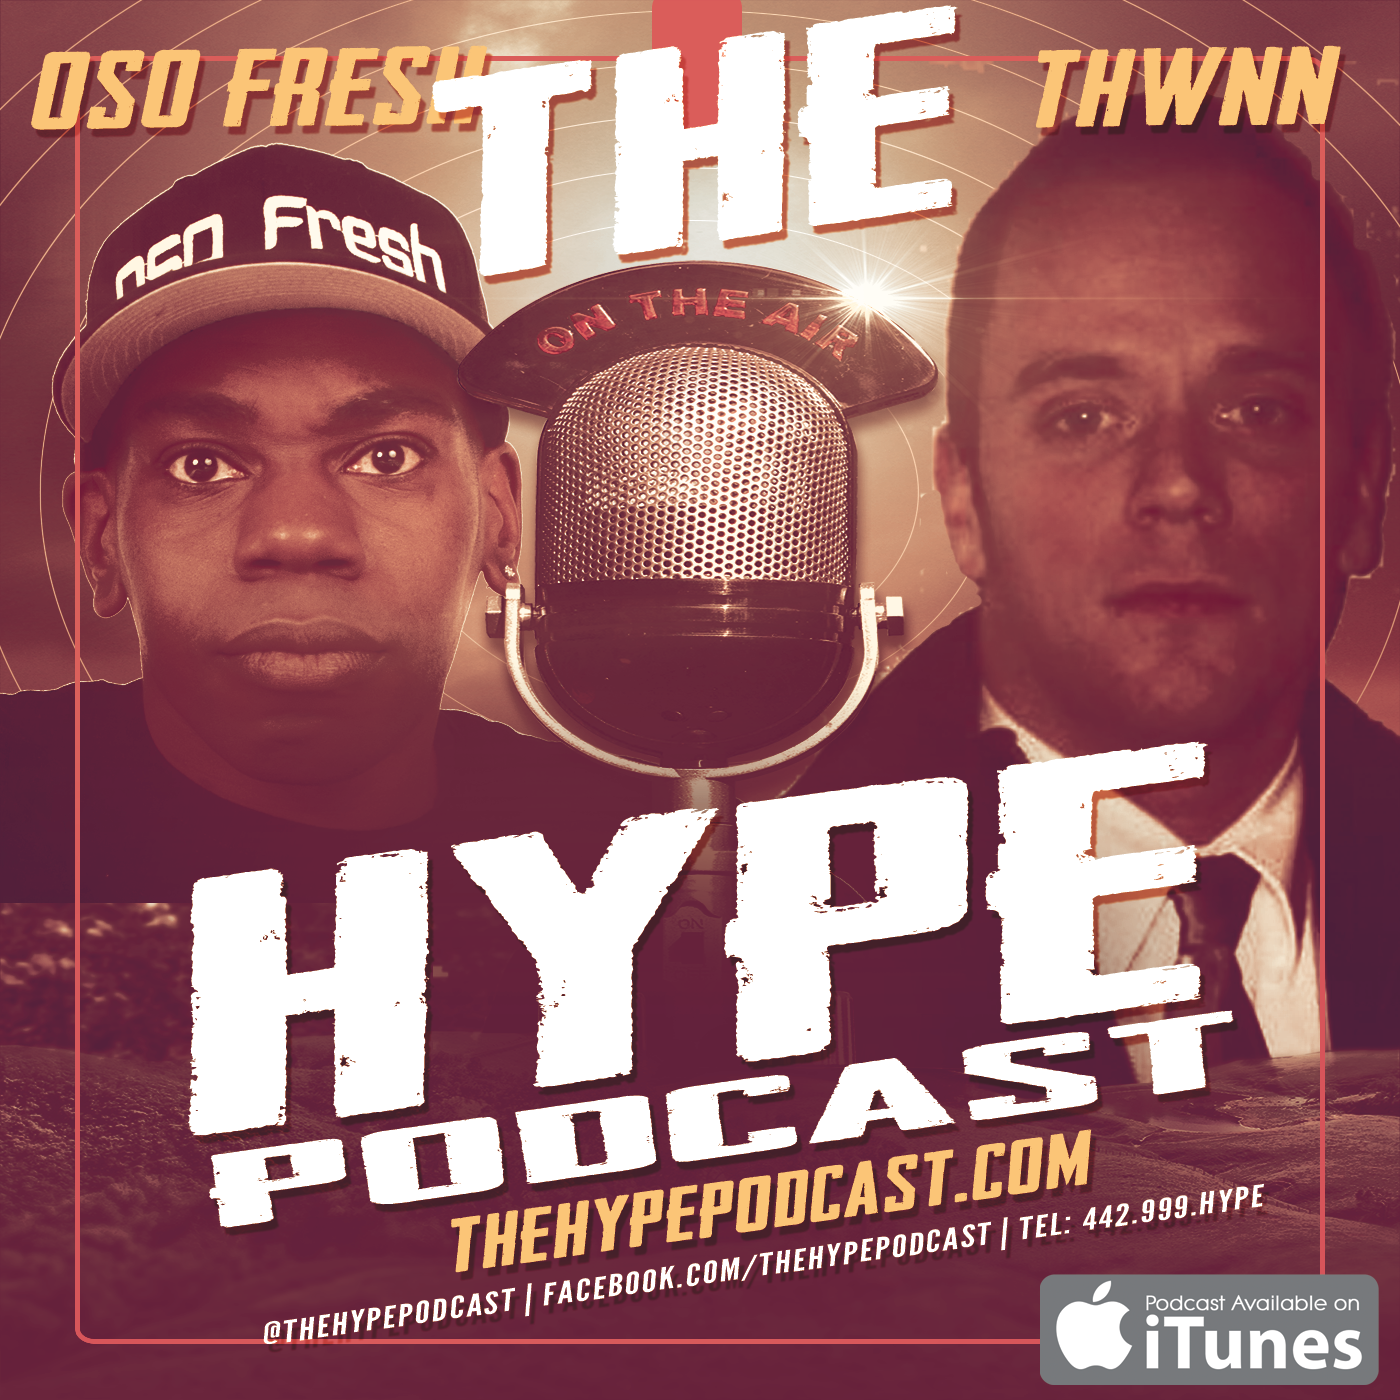 Artwork for hype podcast episode 1009